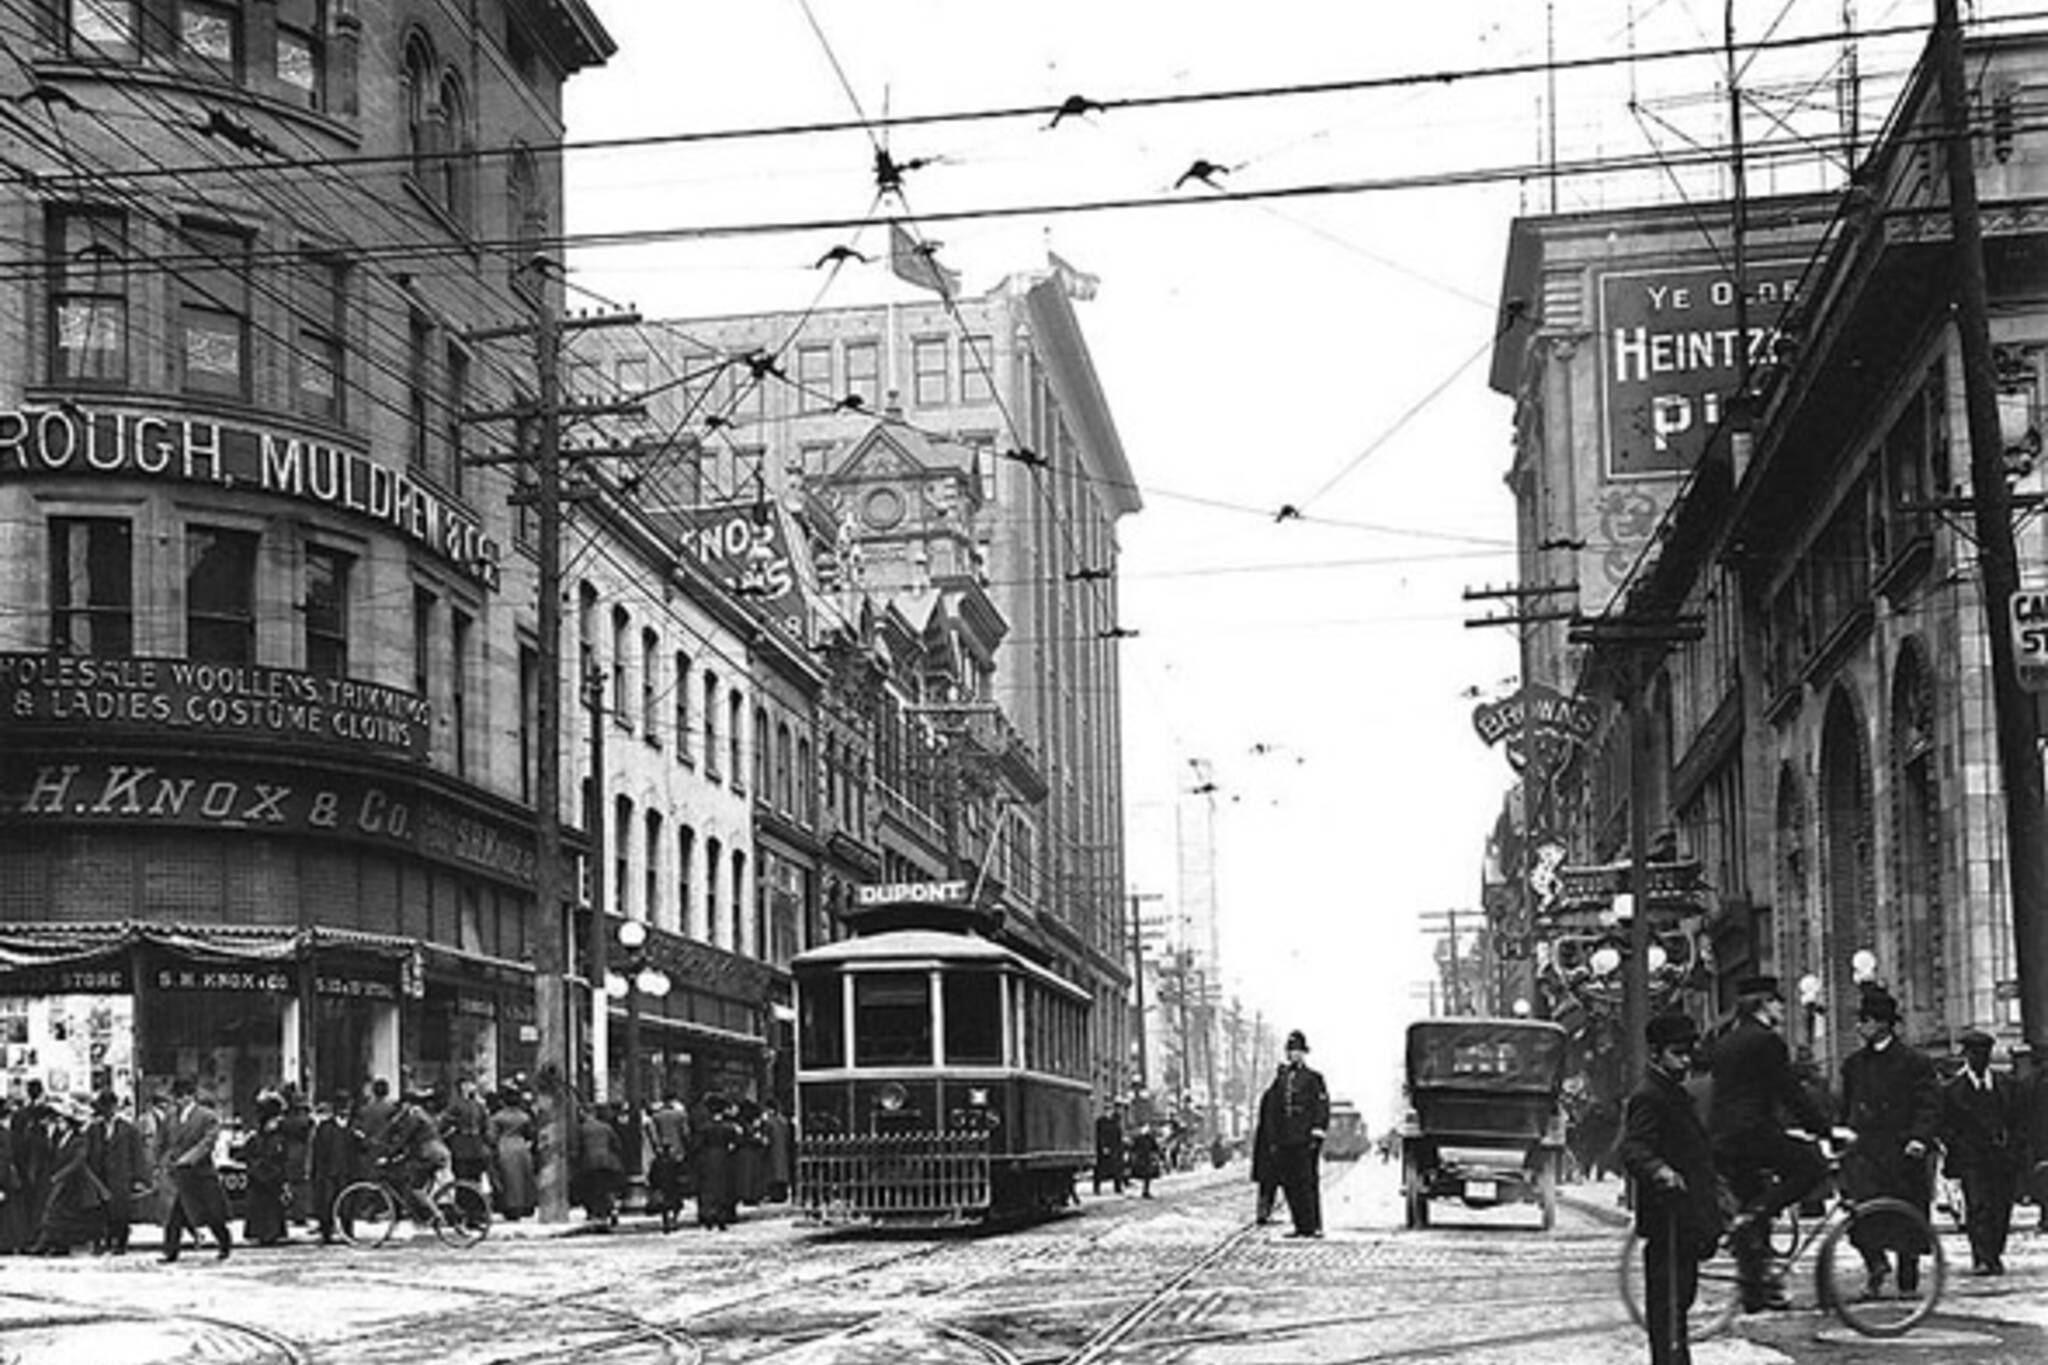 Toronto Vintage Photographs Buy